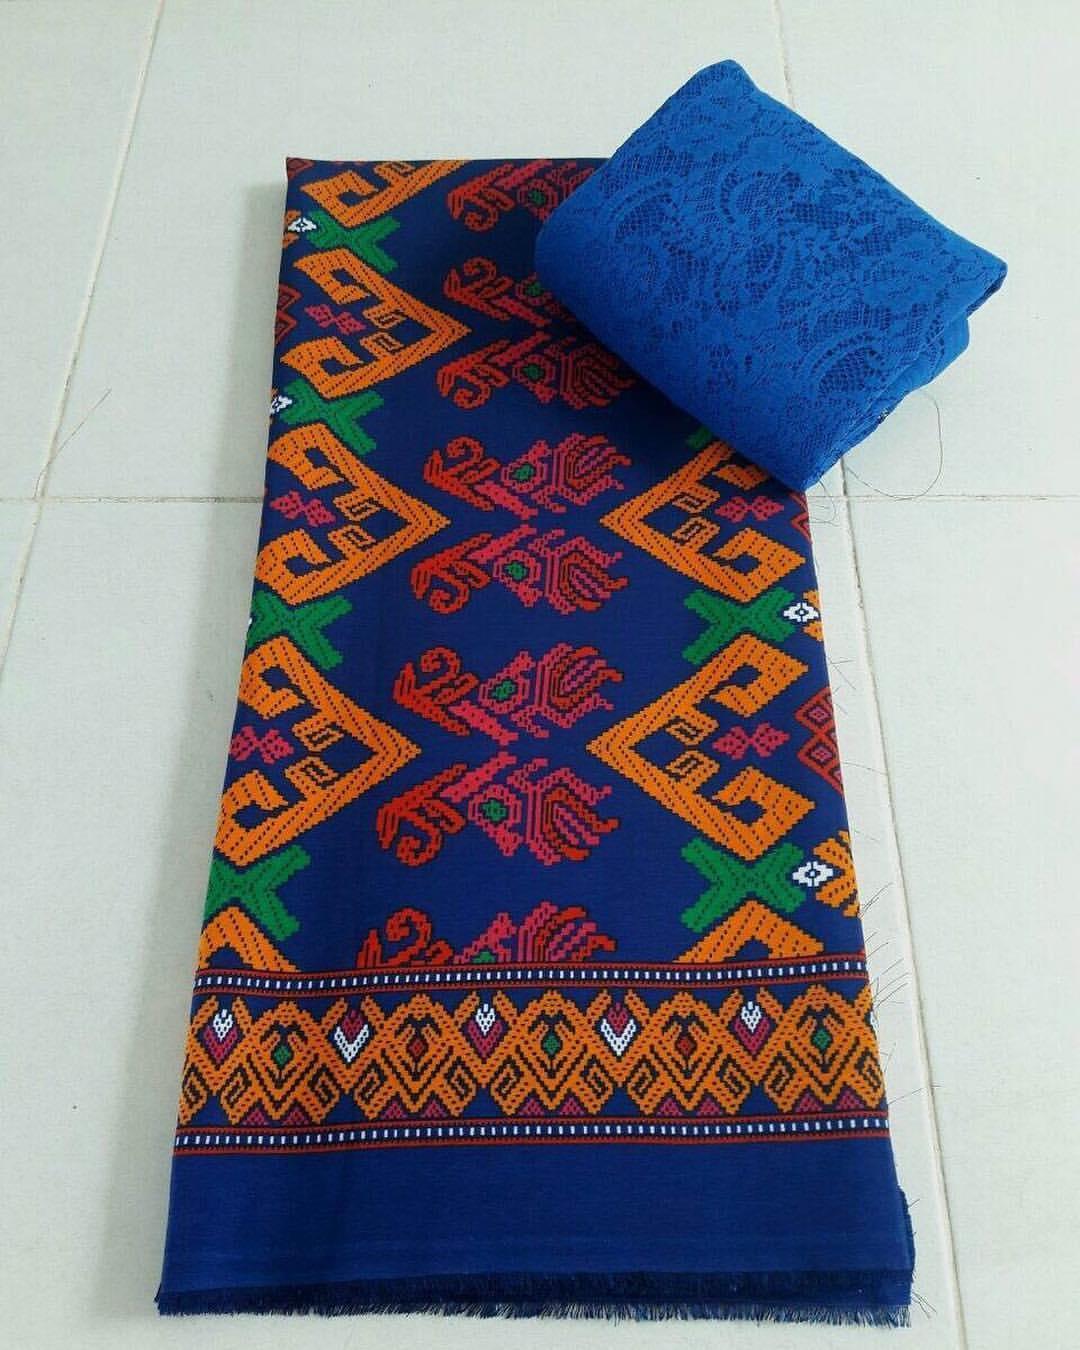 sixmo - setelan kain satin songket bisma batik bali dan kain brokat lembaran bahan kebaya bali murah kebaya modern kebaya pengantin kebaya wisuda bahan rok lilit